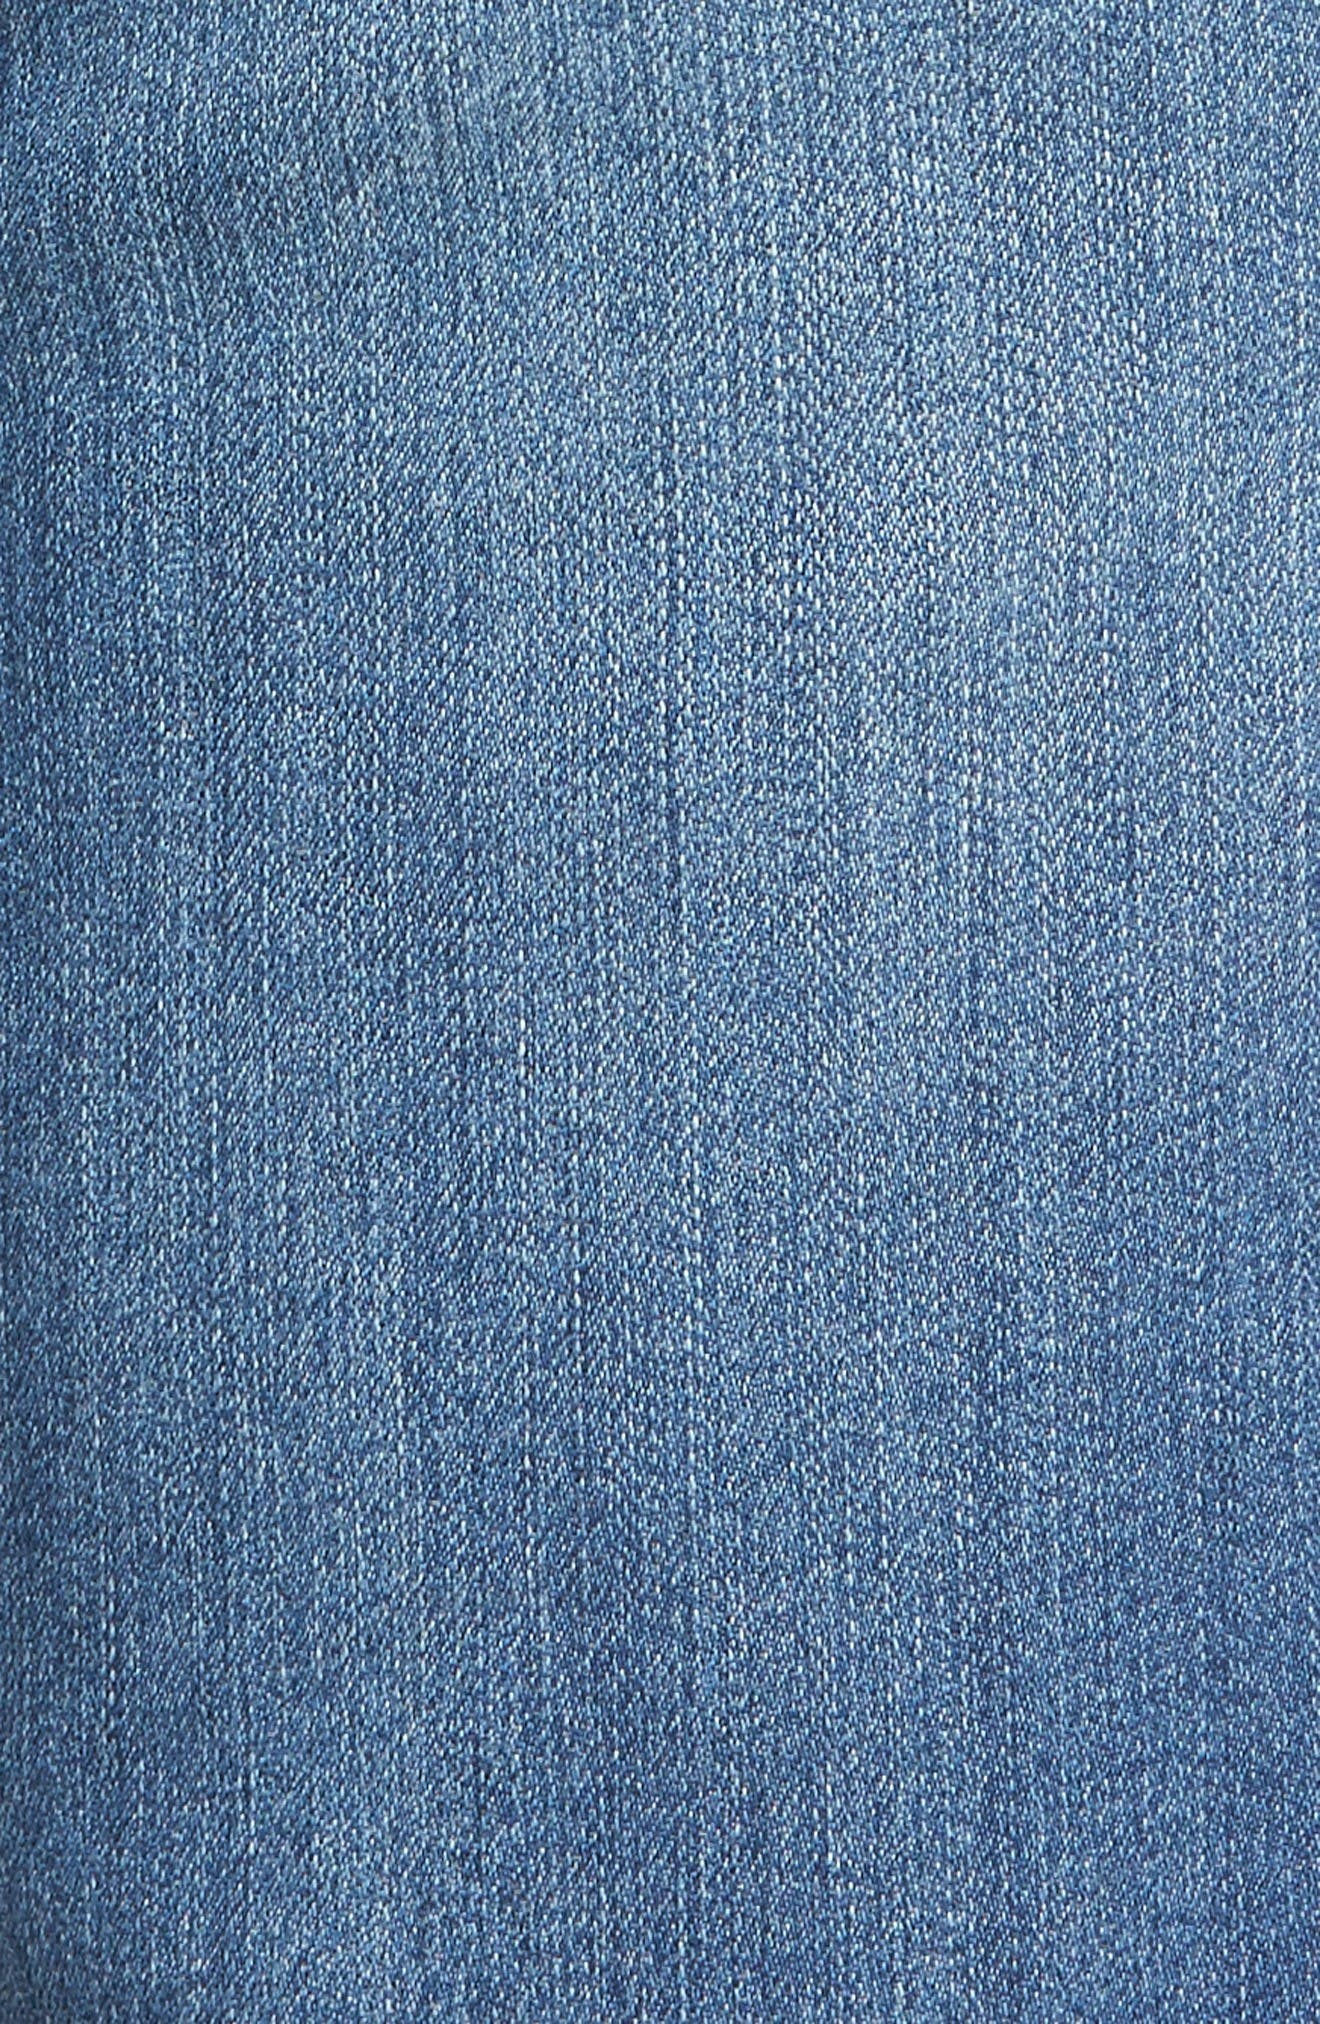 Alternate Image 6  - Wit & Wisdom Ab Solution Denim Bermuda Shorts (Nordstrom Exclusive)